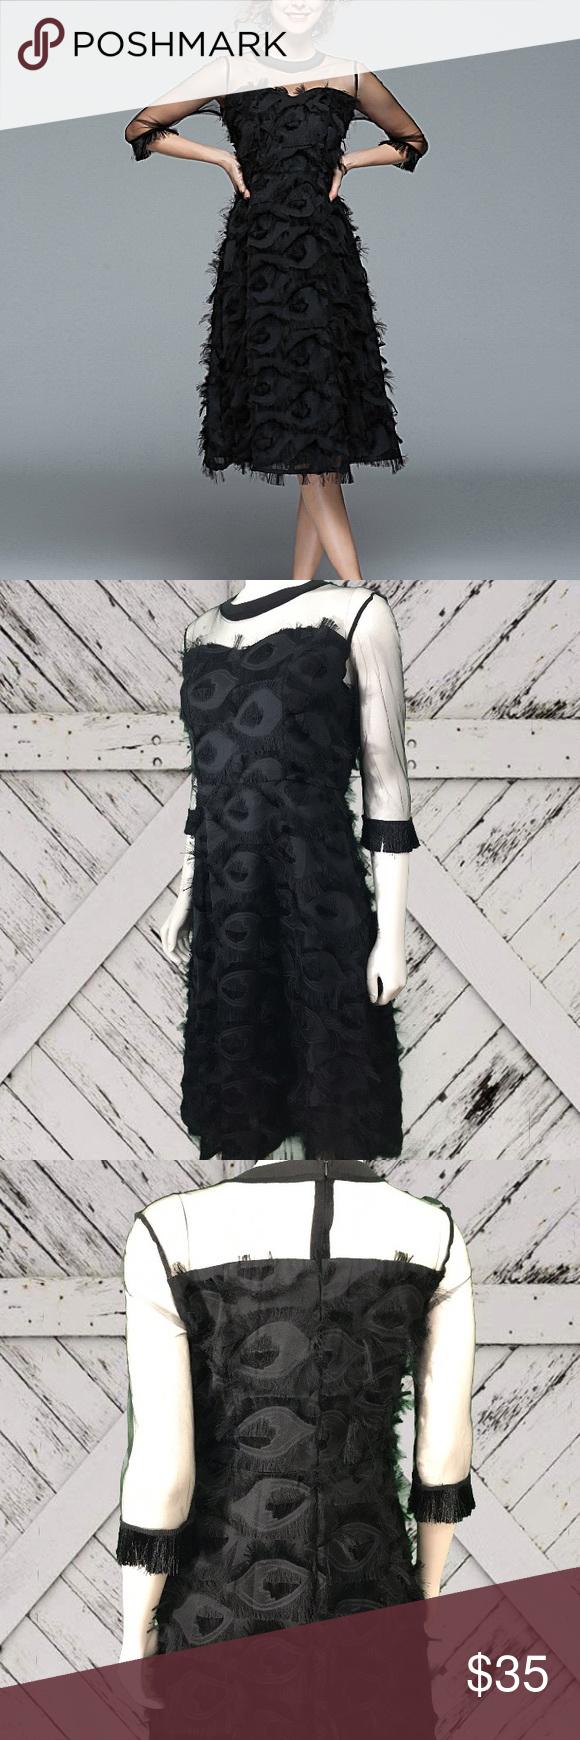 5fe65e17b0d2c Coeur de Vague Feather Midi Dress Brand new with tags Beautiful dress!!  Sheer 3